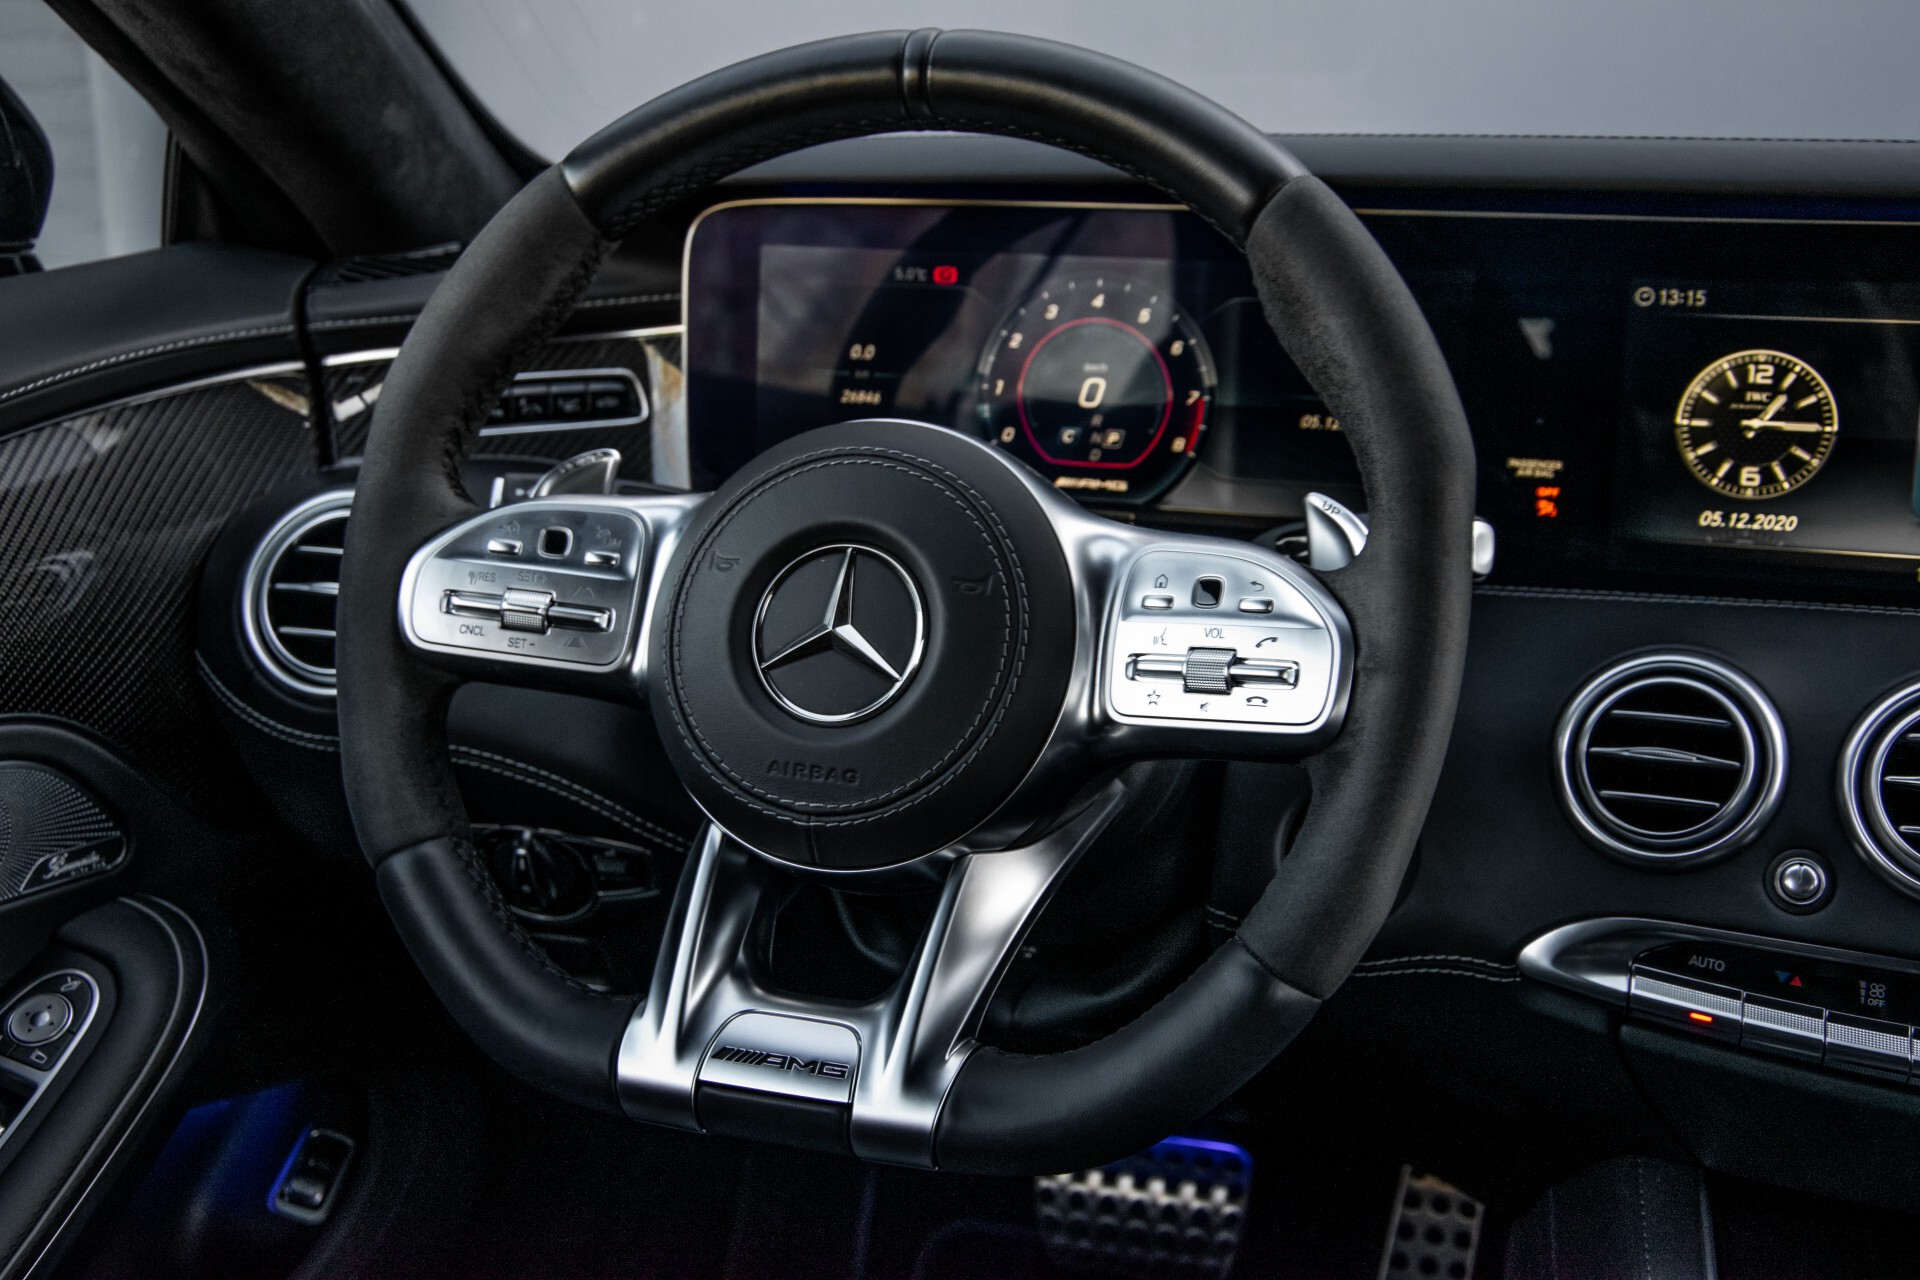 Mercedes-Benz S-Klasse Cabrio 63 AMG 4M+ Keramisch/Burmester High End 3D/Carbon/Driverspack/Blackpack Aut9 Foto 10